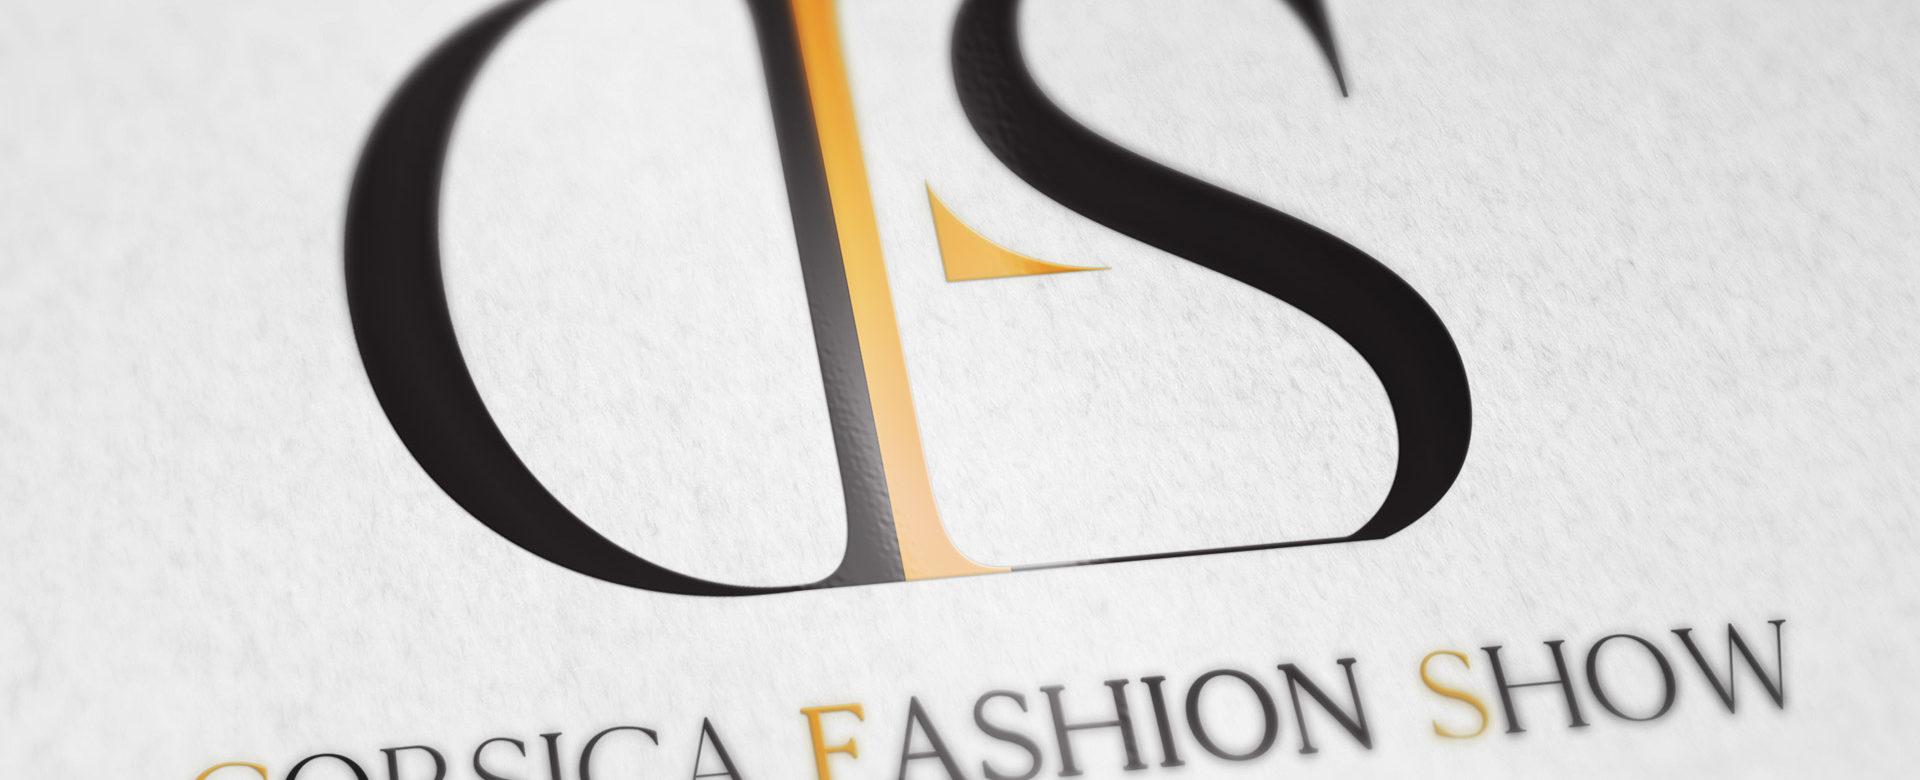 corsica-fashion-show-logo-corse